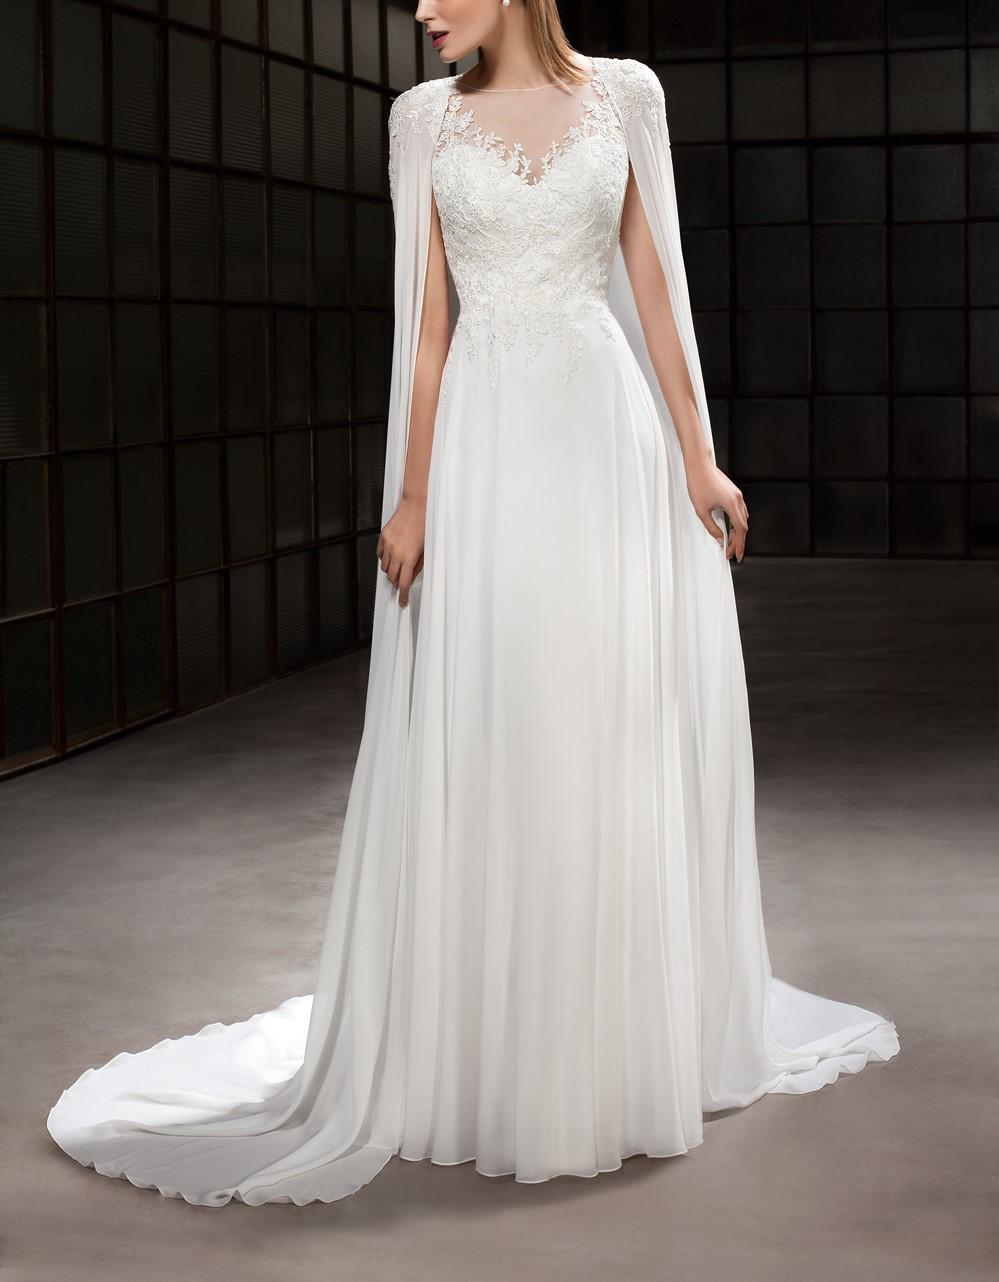 robe de mari e t avec cape amovible blanche. Black Bedroom Furniture Sets. Home Design Ideas